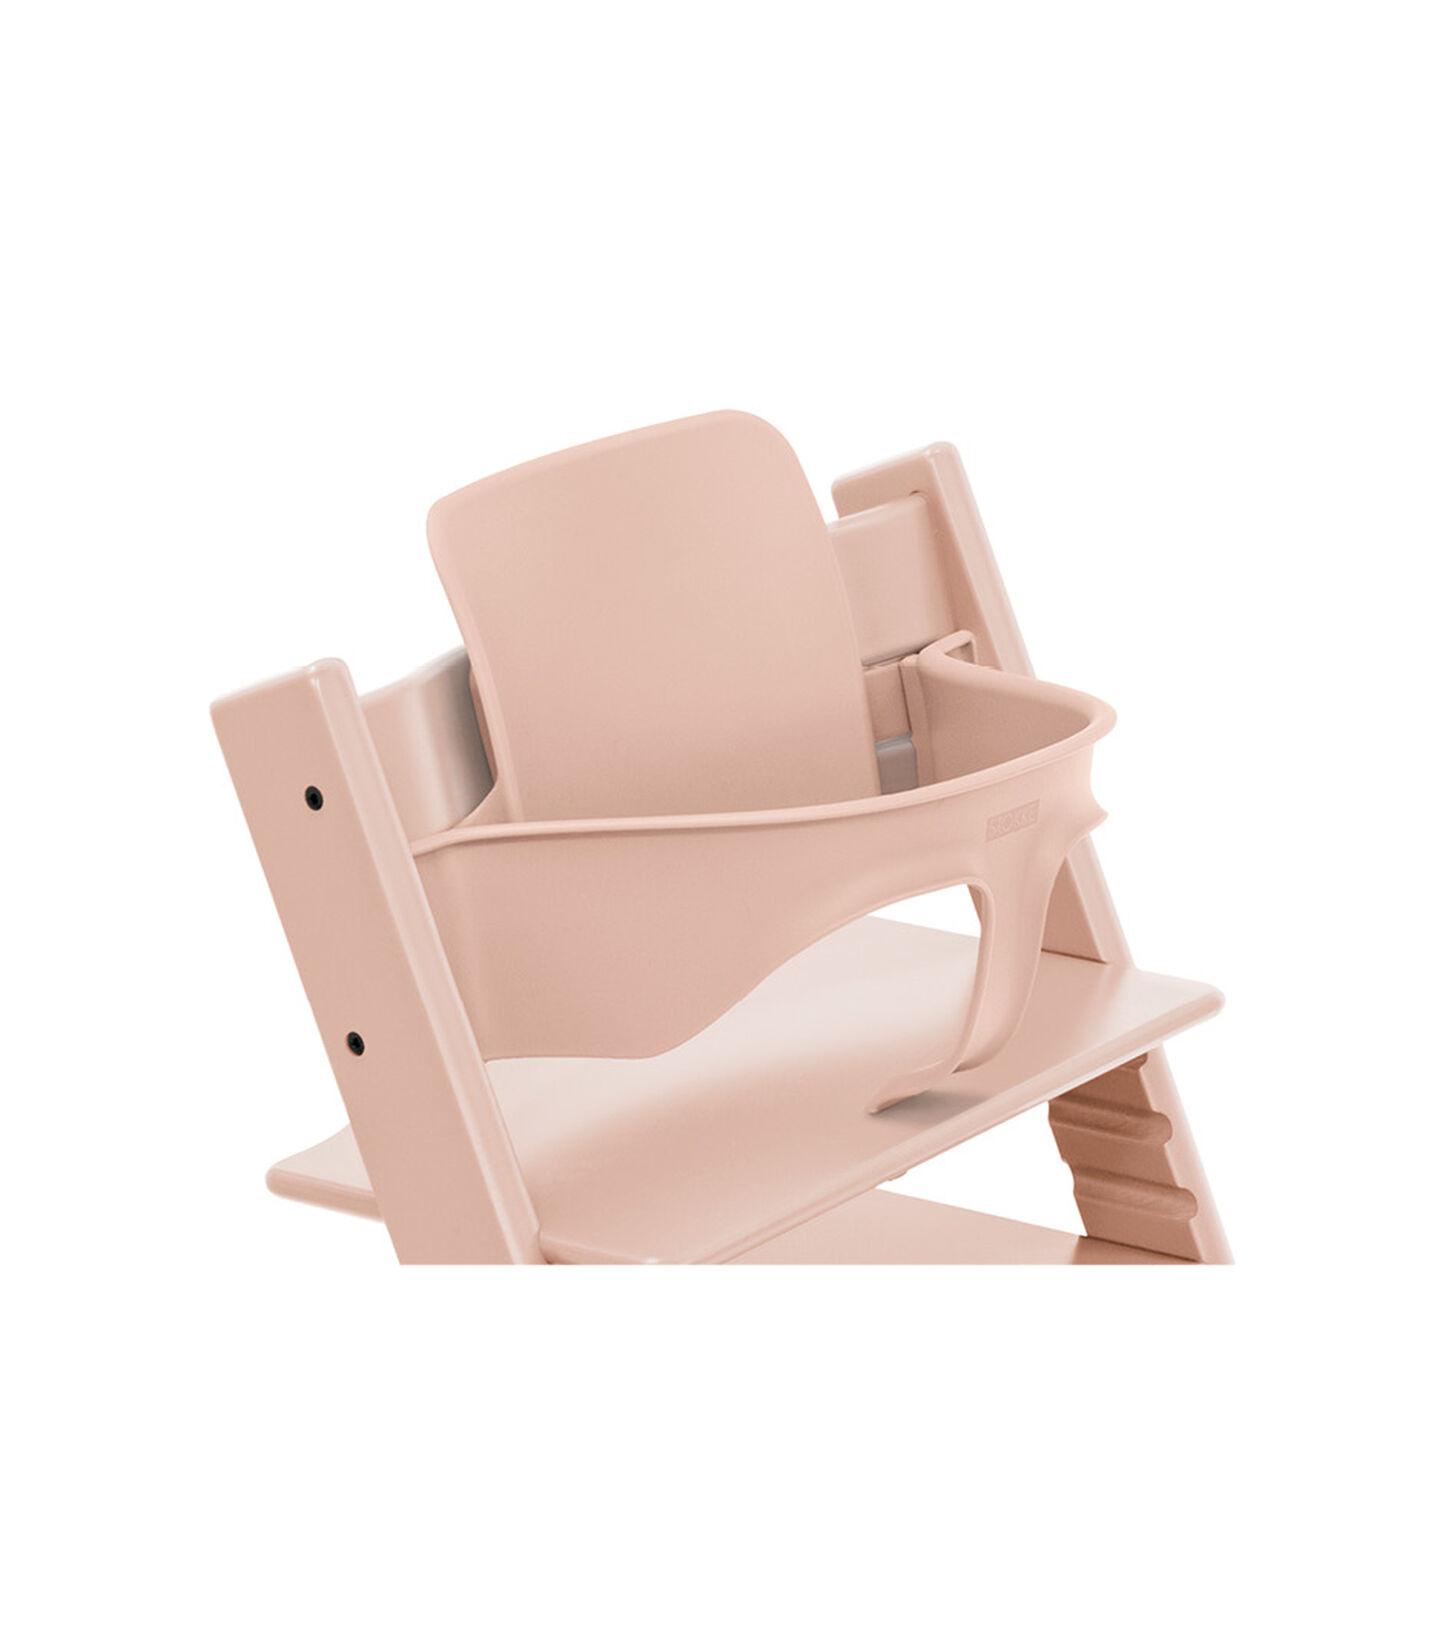 Tripp Trapp® Baby Set Serene Pink, Serene Pink, mainview view 1